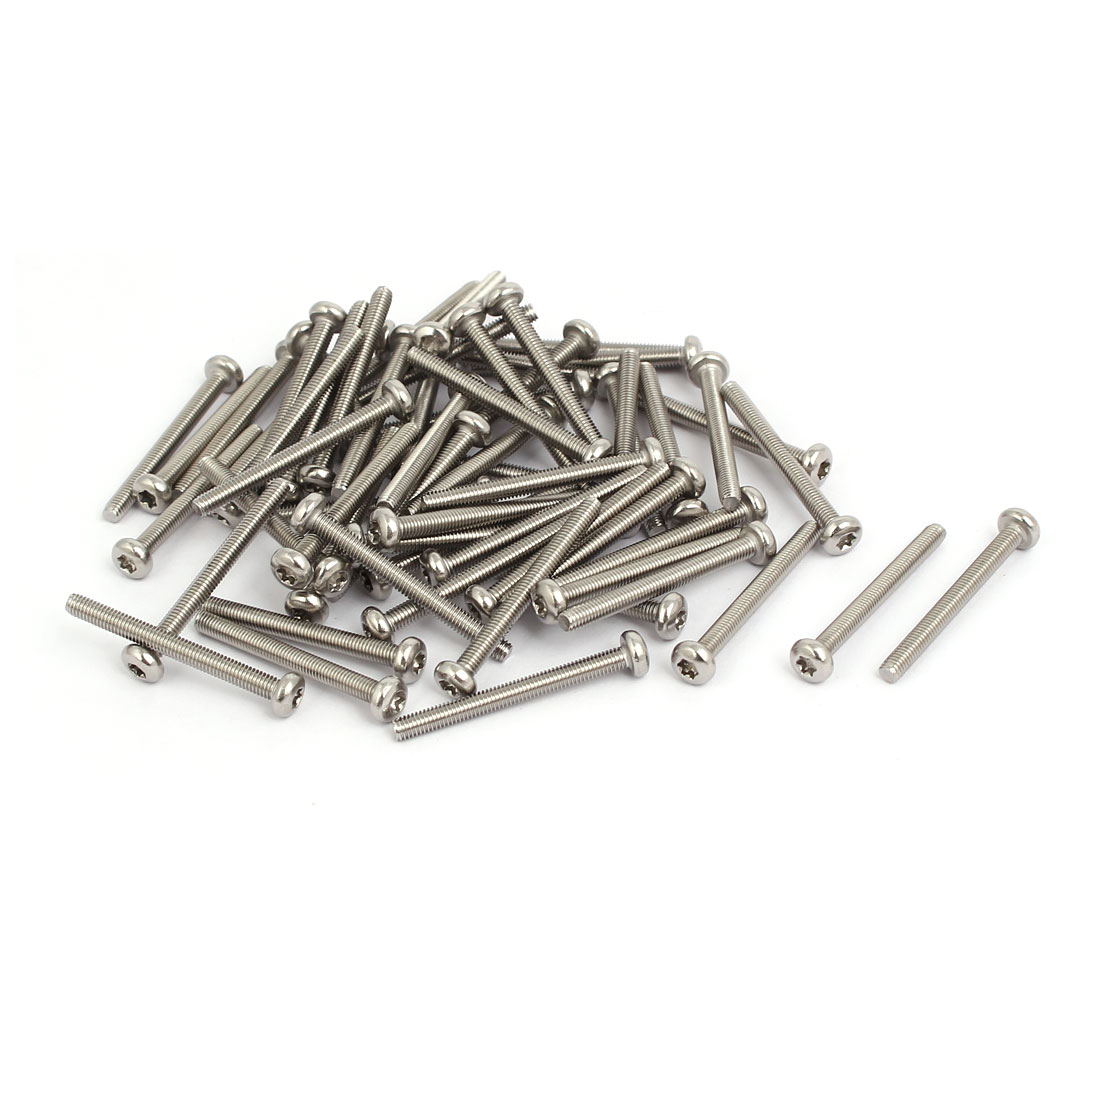 M3x30mm 304 Stainless Steel Button Head Torx Screws Fasteners 60pcs